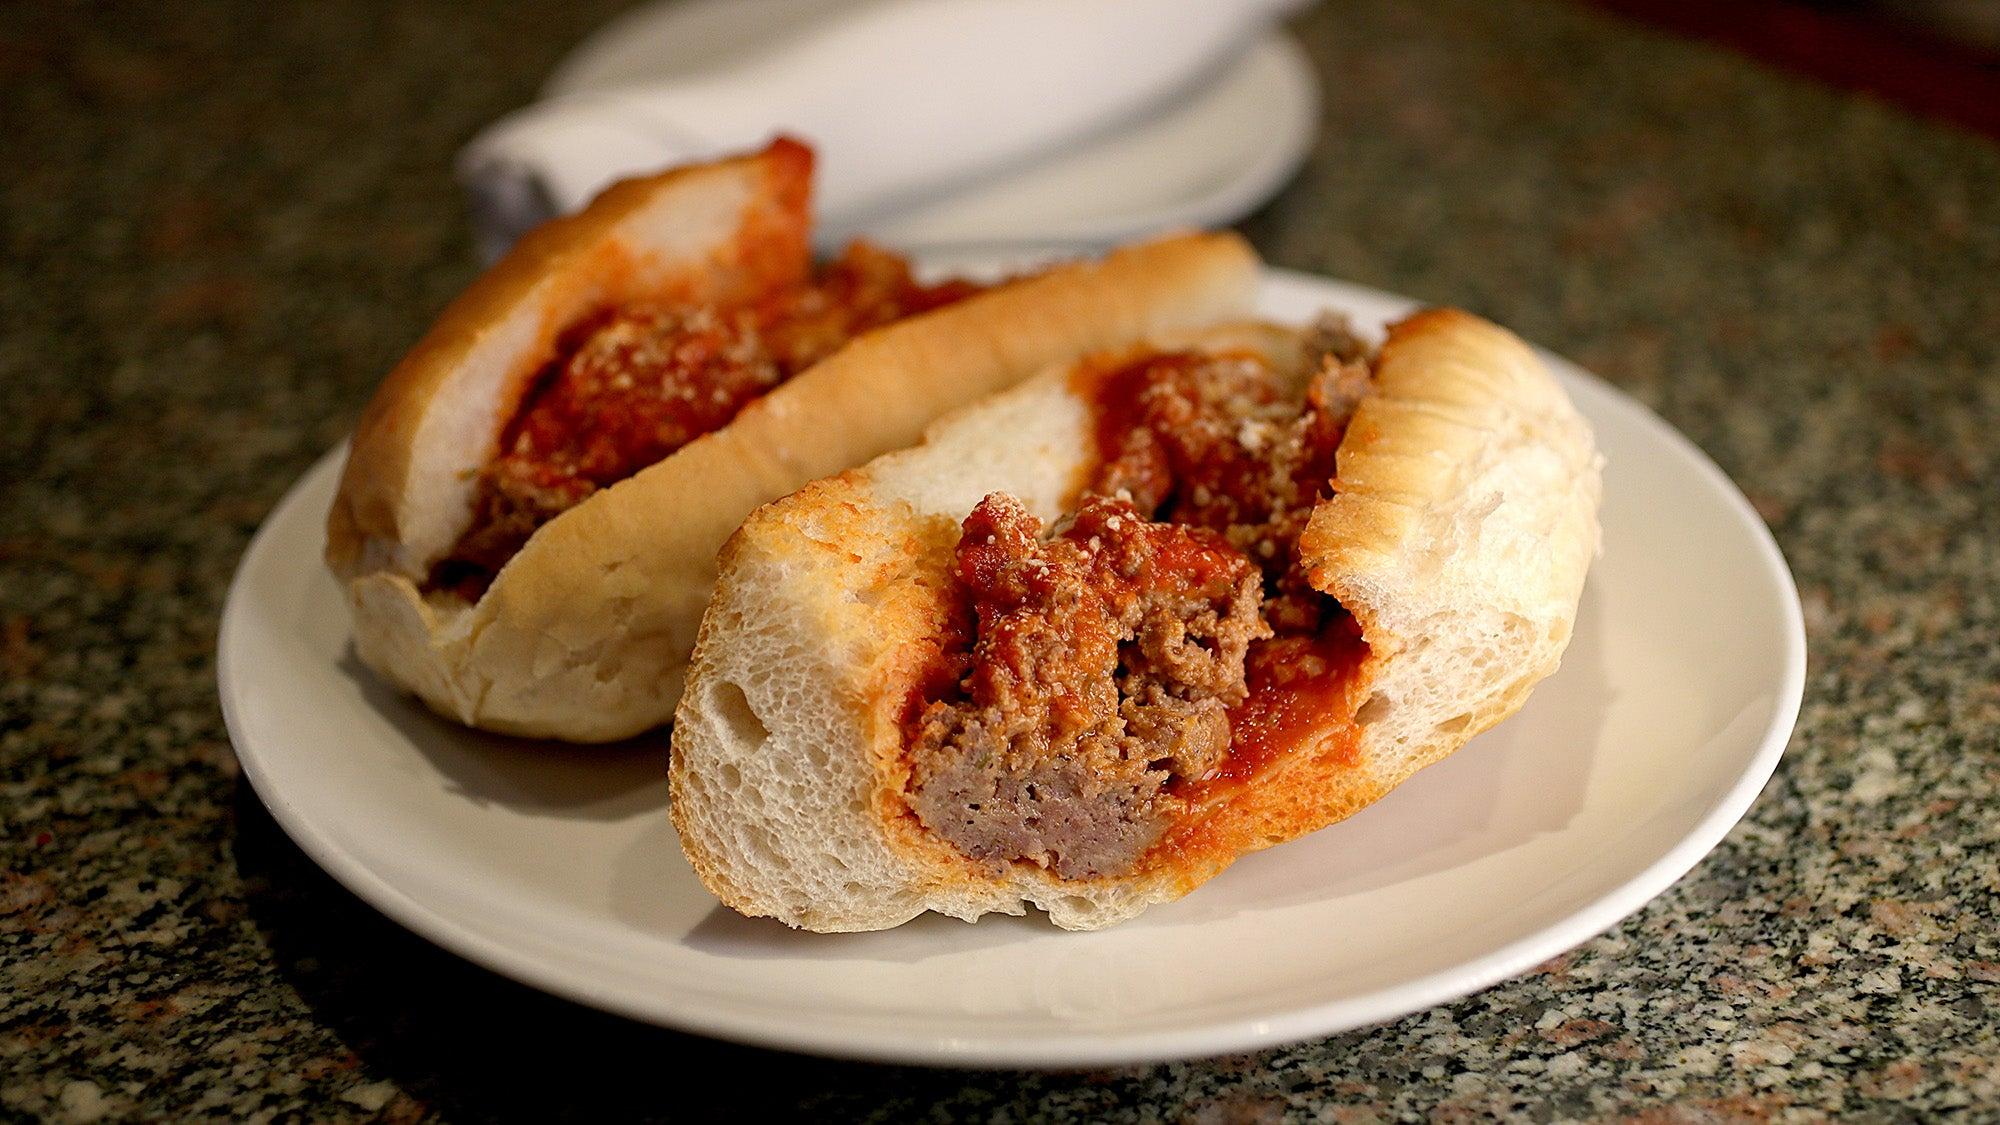 Meatball panini at Artú